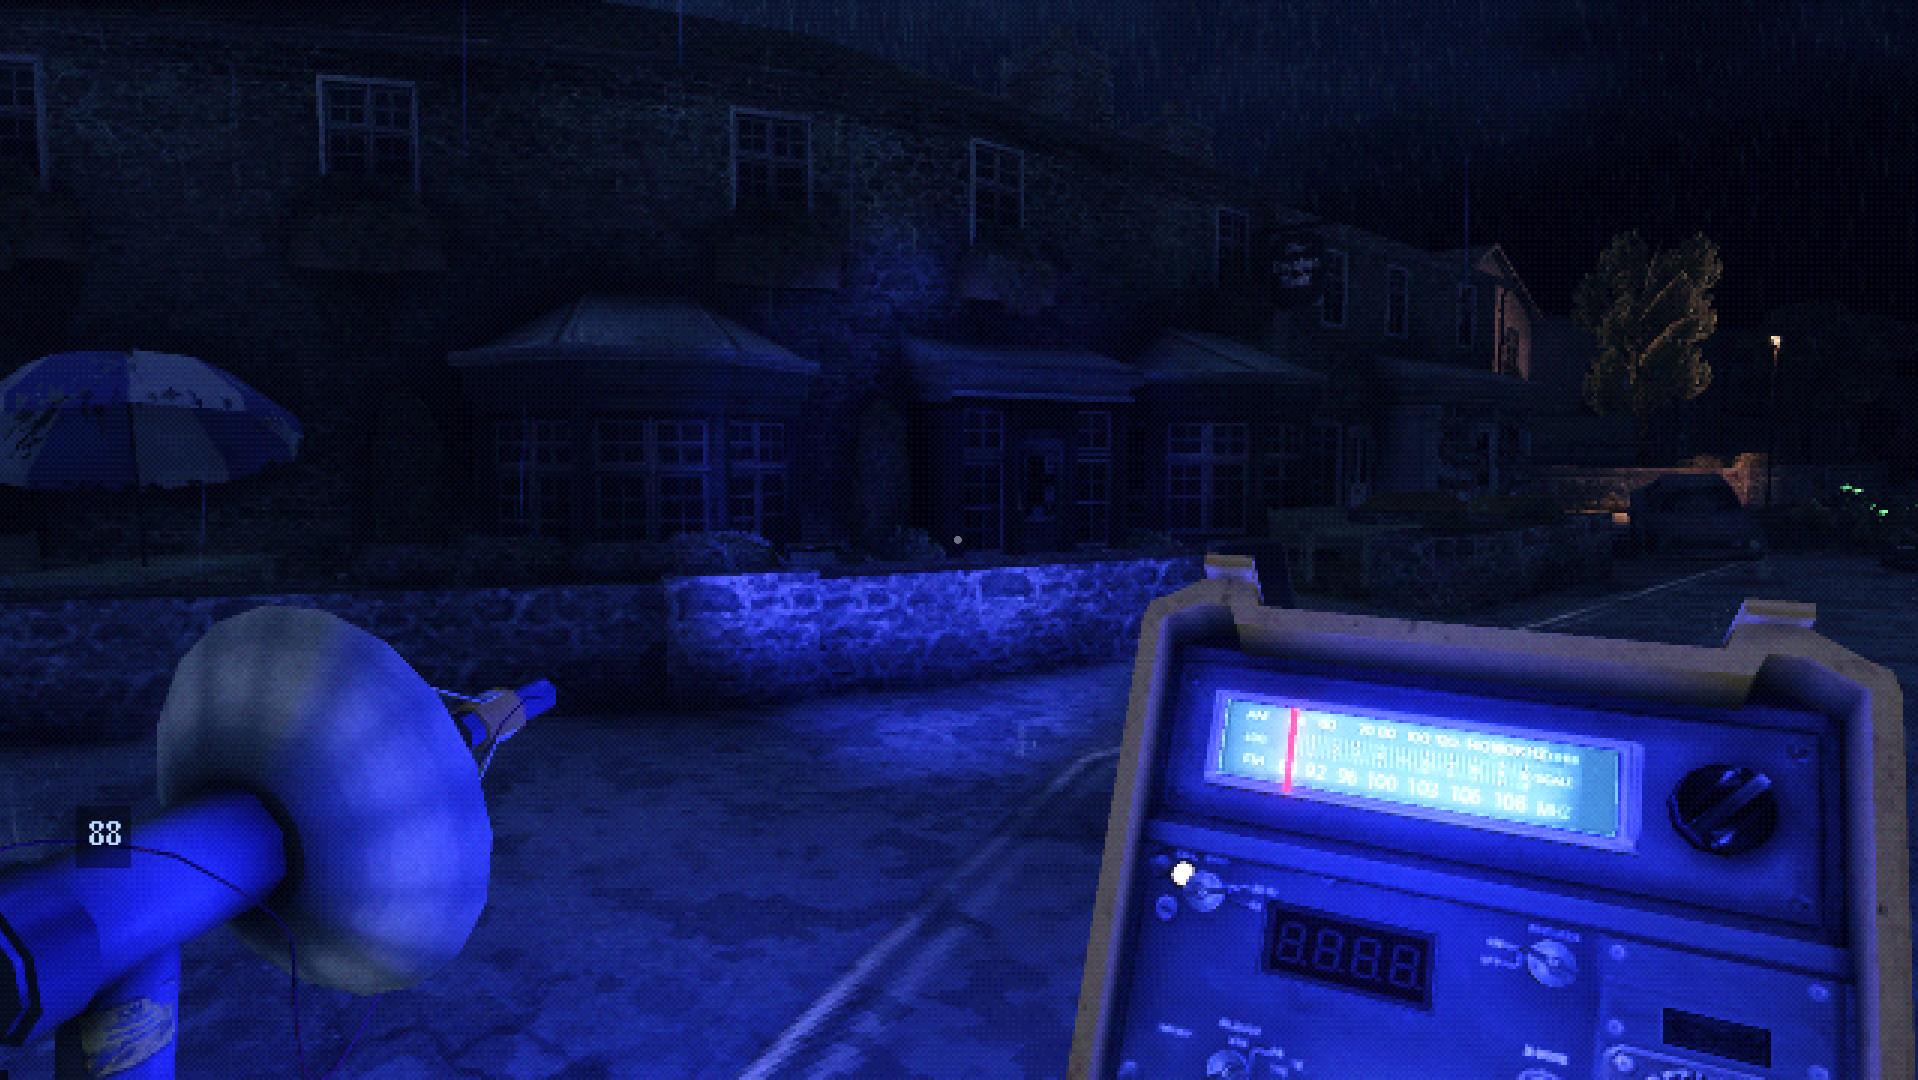 PS1风格恐怖游戏《追逐电波》10月14日登陆Steam